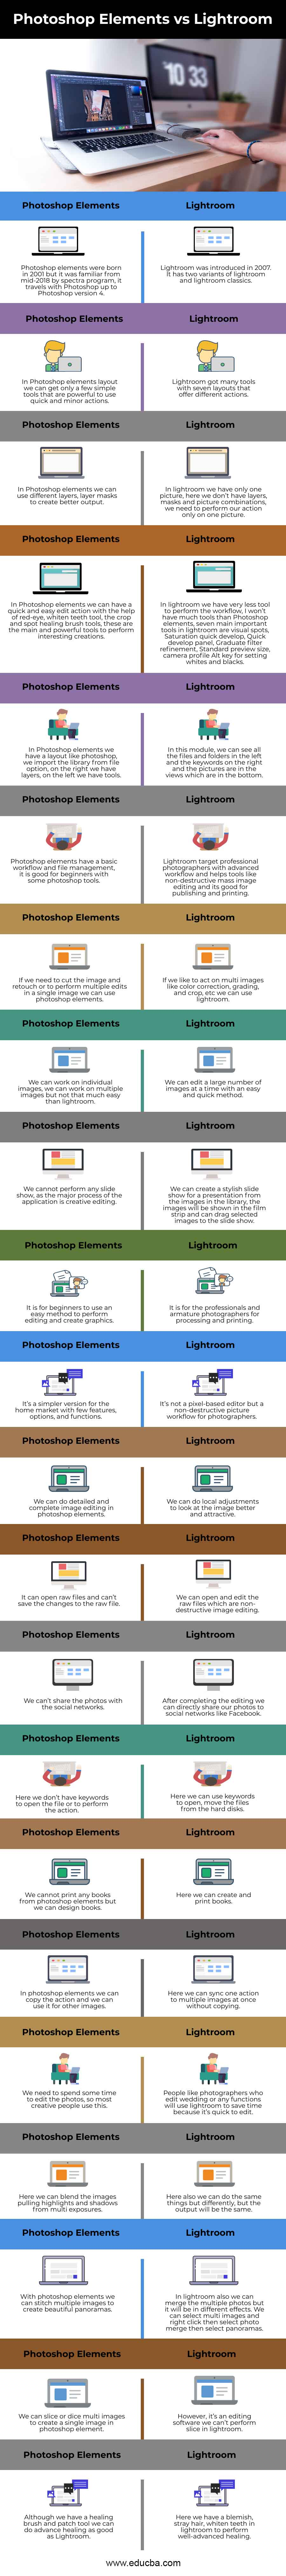 Photoshop Elements vs Lightroom info